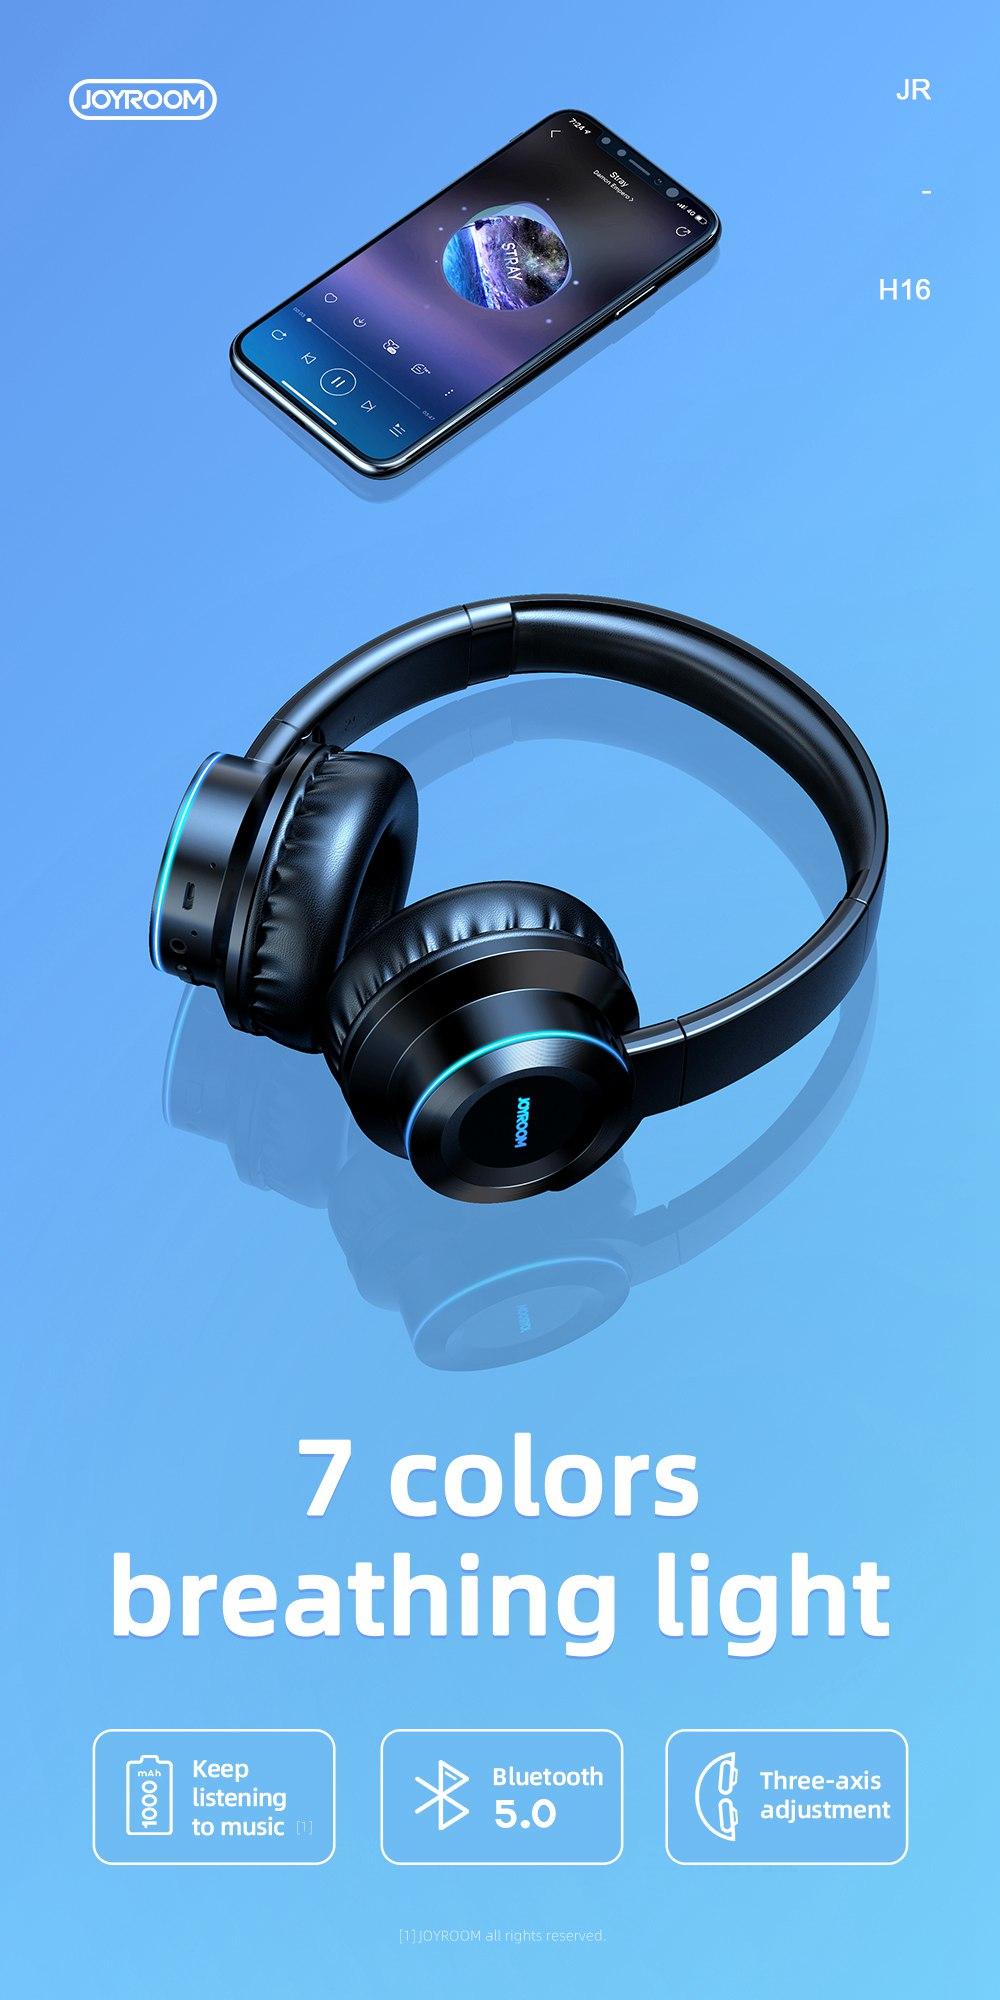 JOYROOM JR-H16 3.5mm Bluetooth 5.0 Headset CVC 6.0 1000mAh Battery 40mm Iron Driver Unit